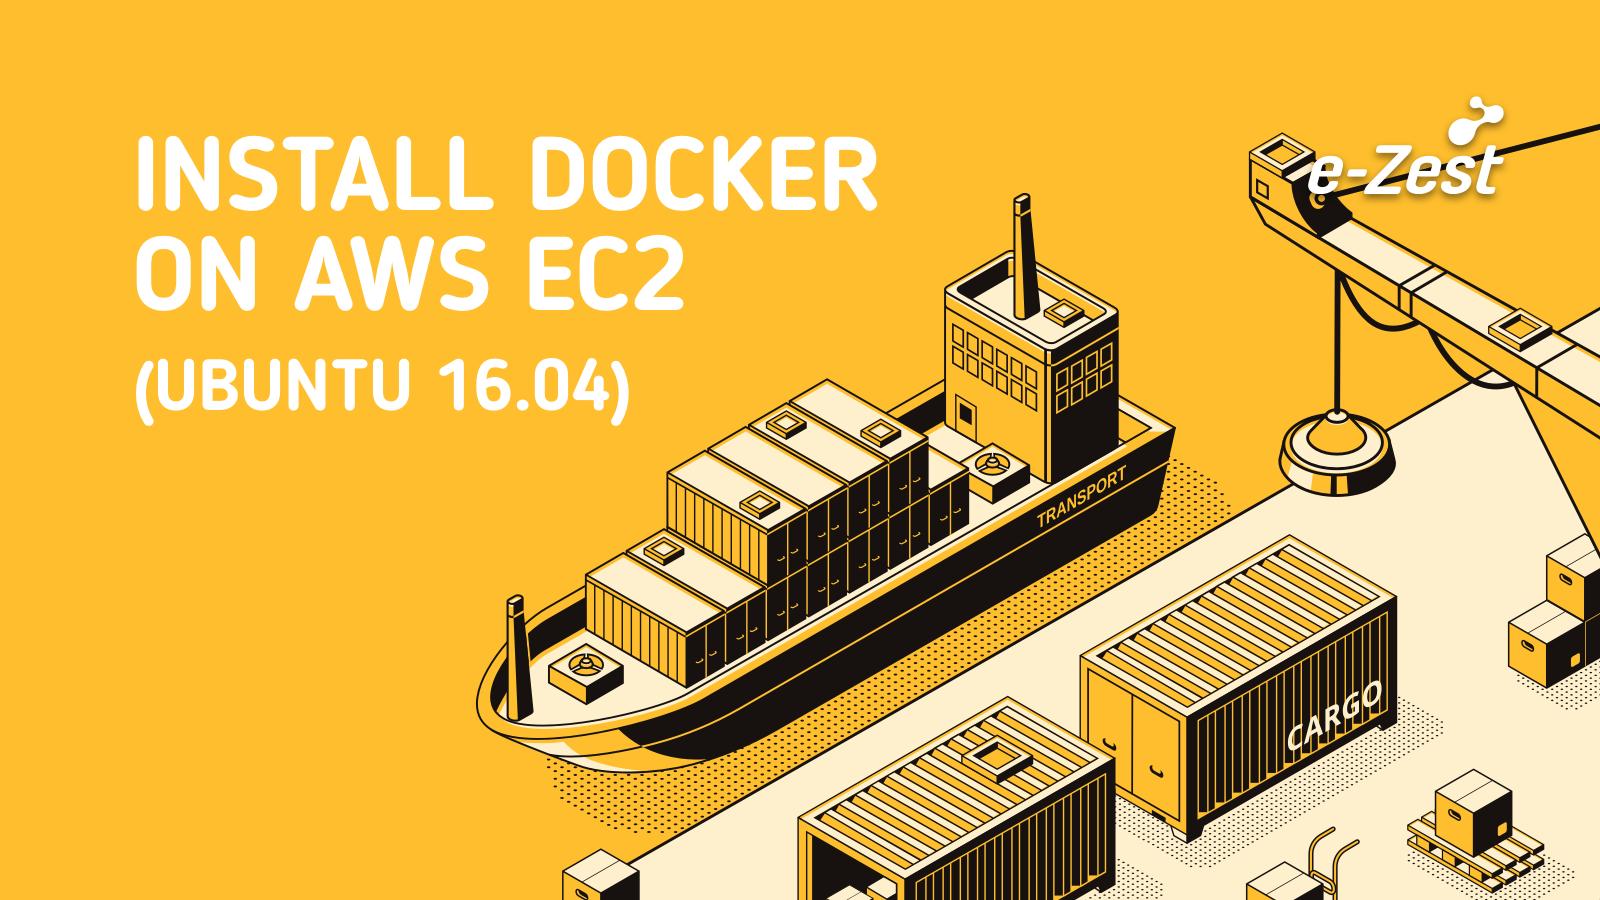 Install Docker on AWS EC2 (Ubuntu 16.04)